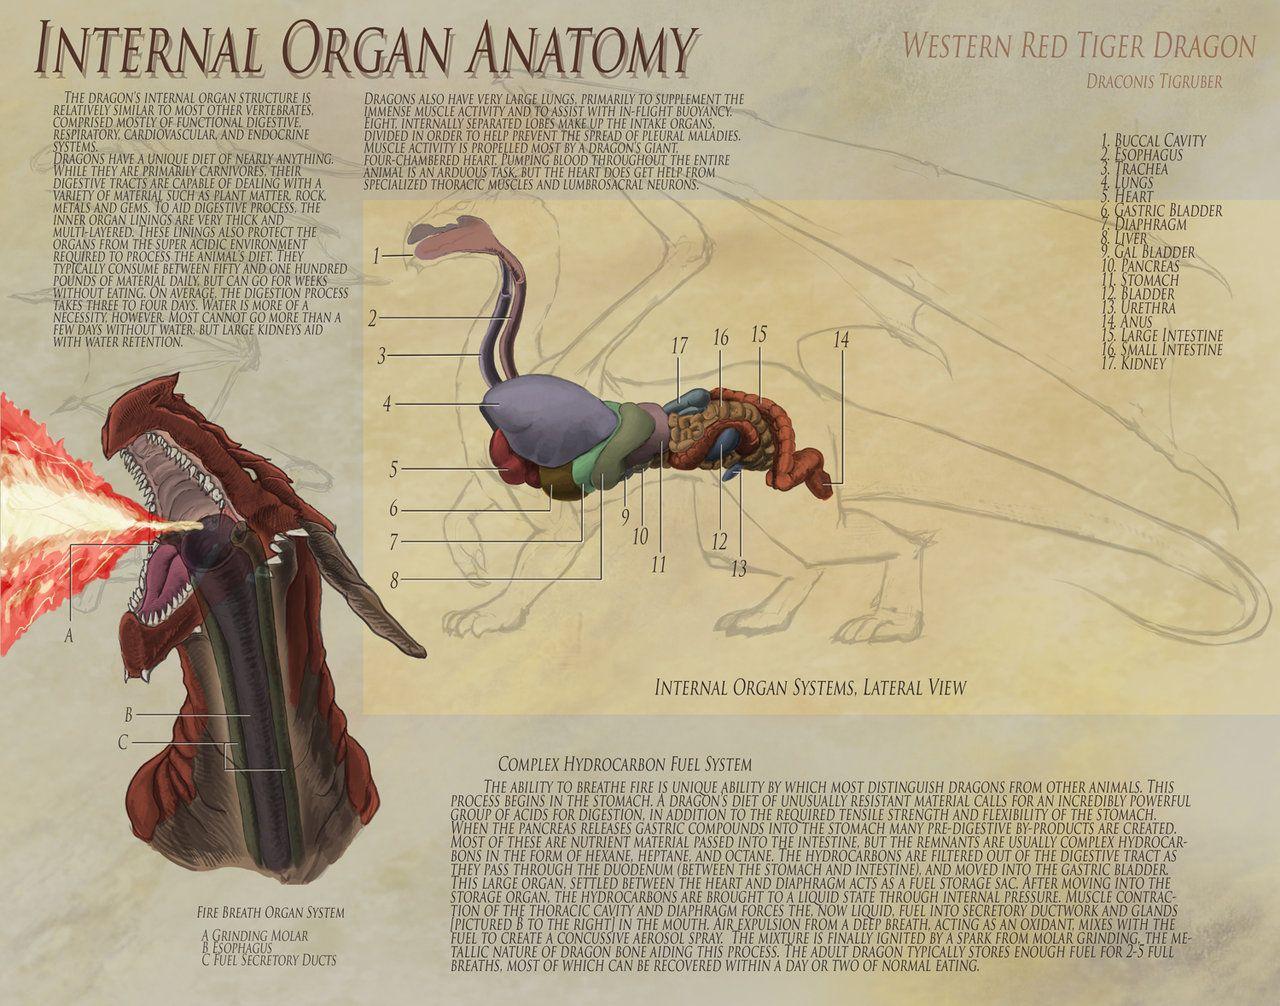 Dragon Anatomy - Organs by UberKudzu   bichxoS   Pinterest ...